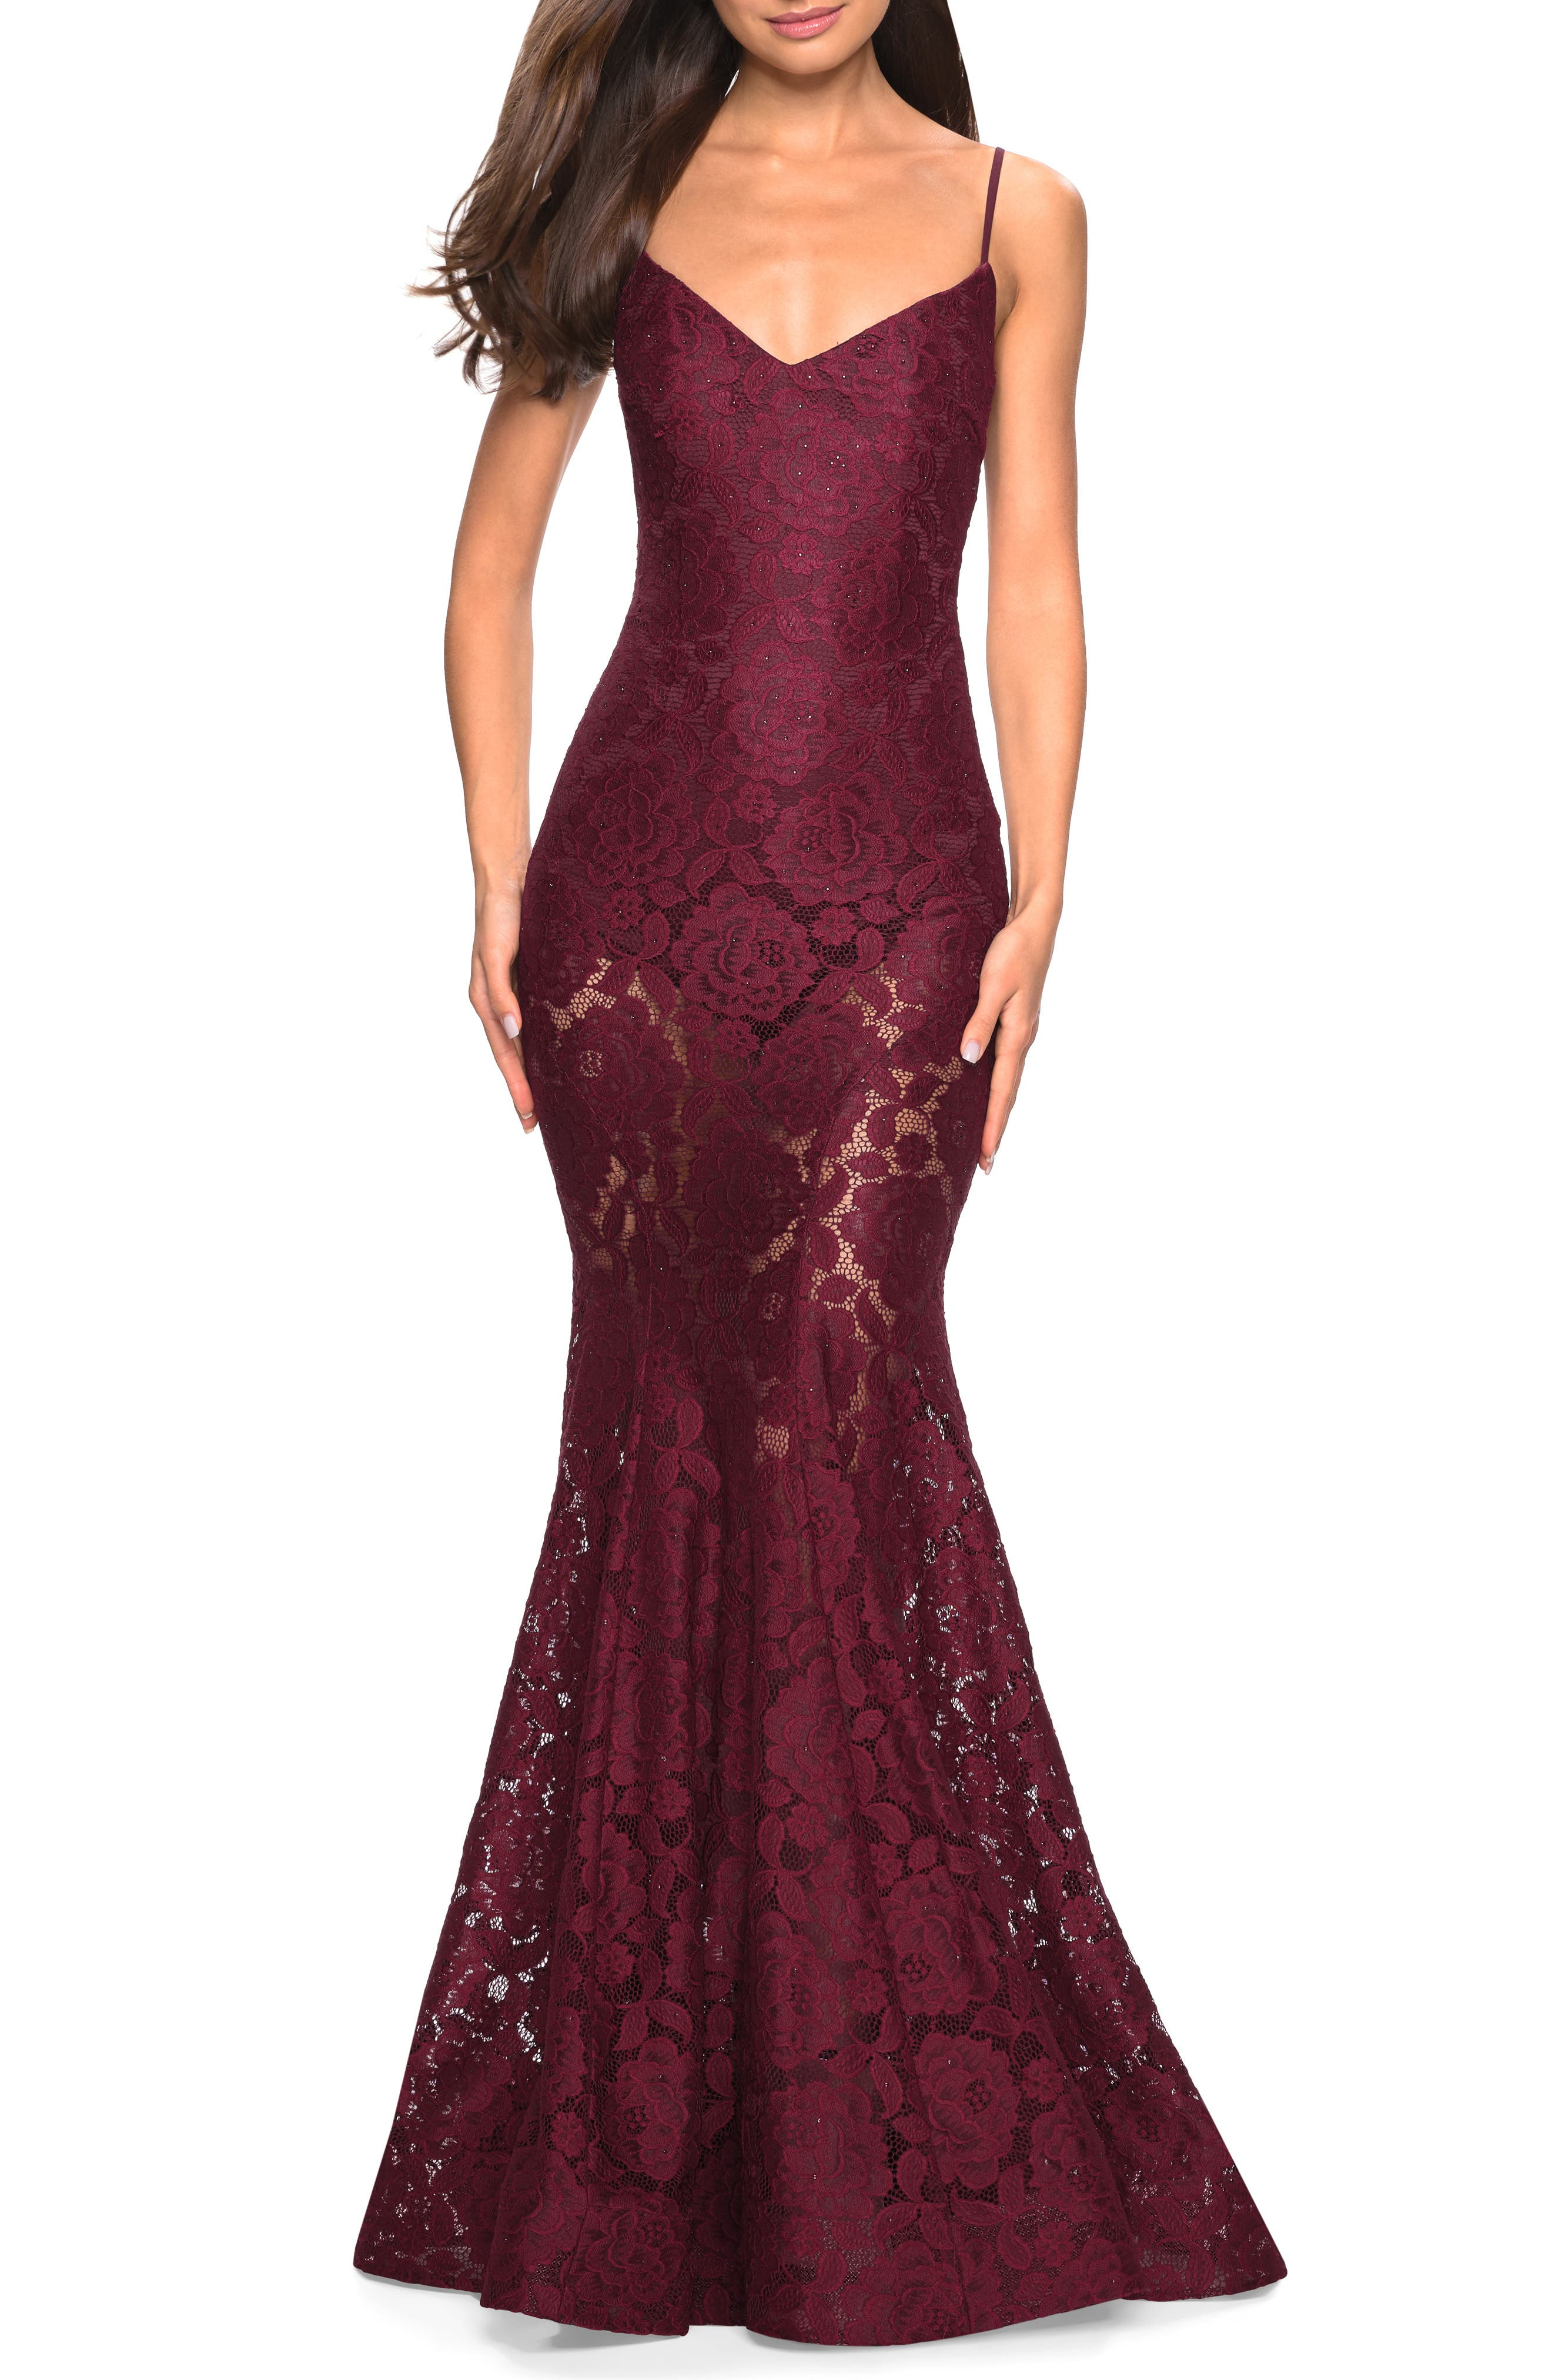 La Femme Stretch Lace Mermaid Evening Dress, Burgundy